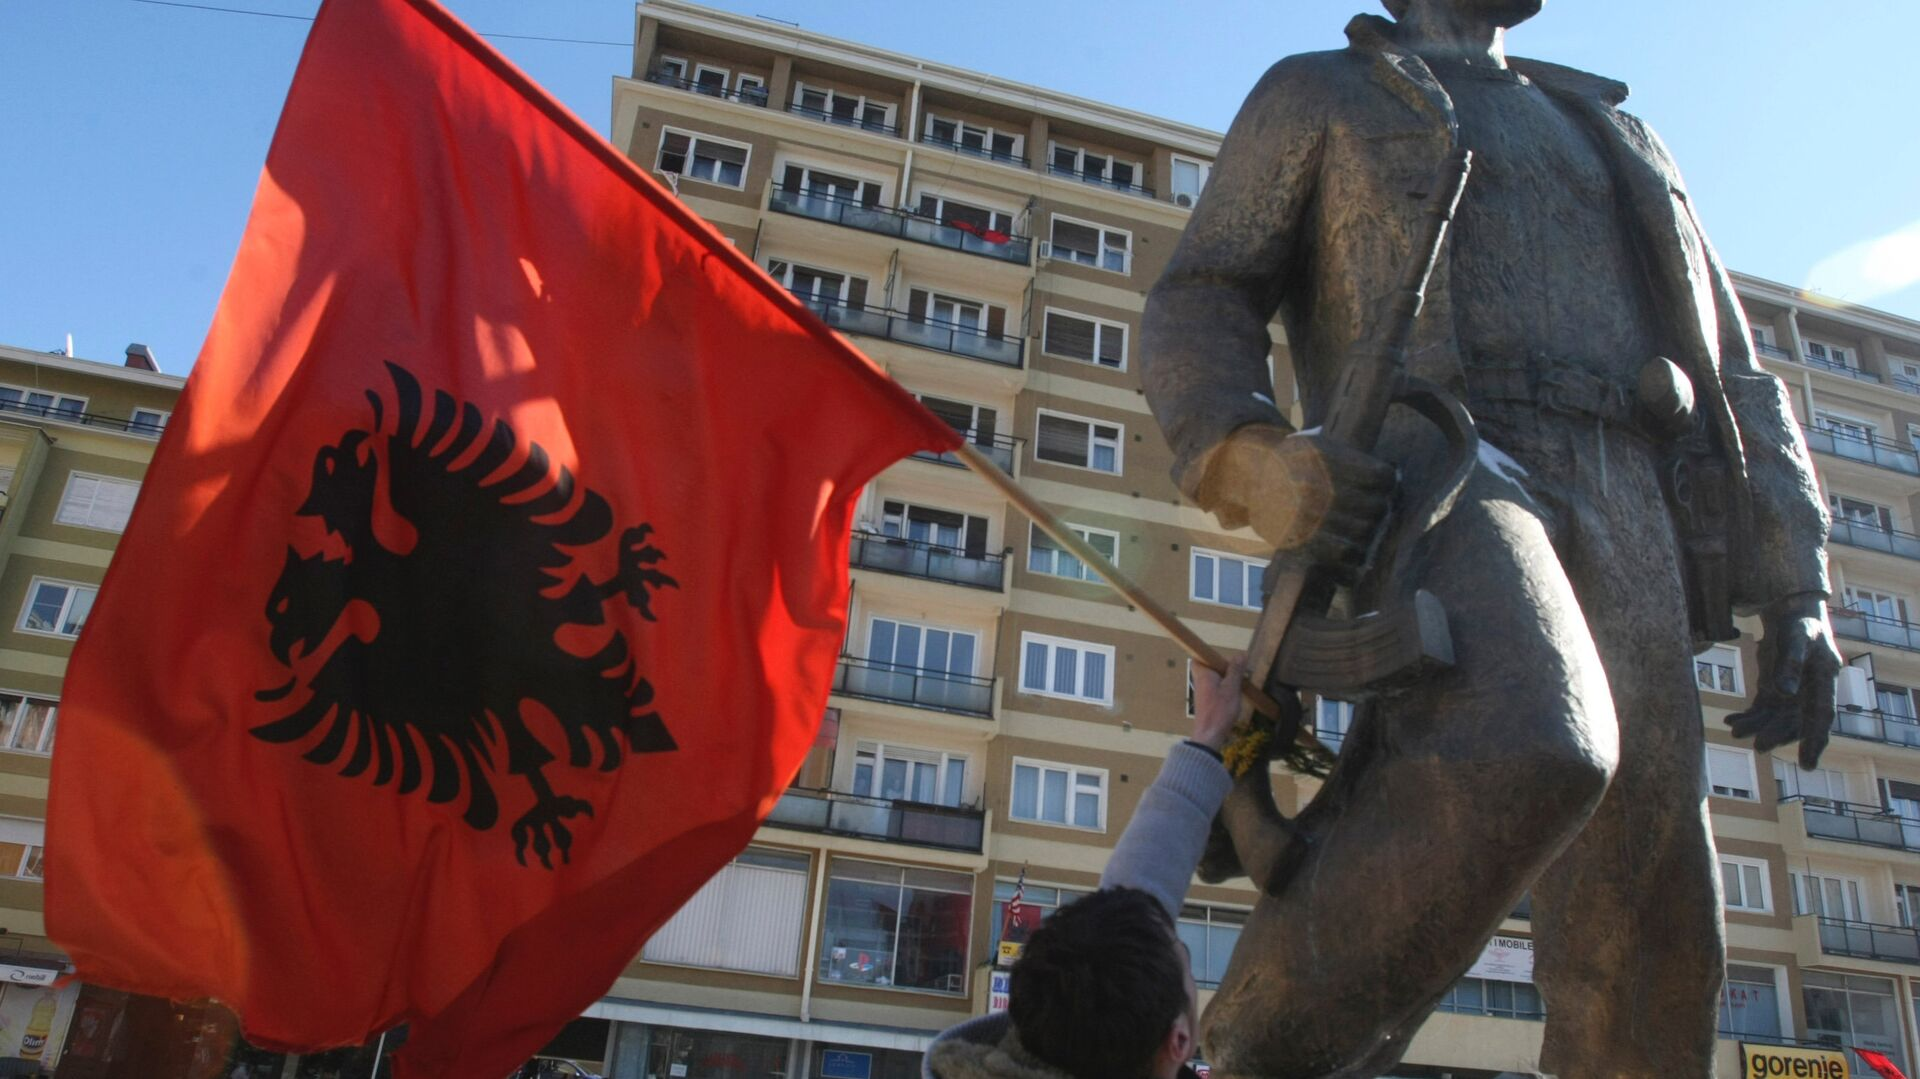 Приштина. Албанский флаг - РИА Новости, 1920, 16.03.2021